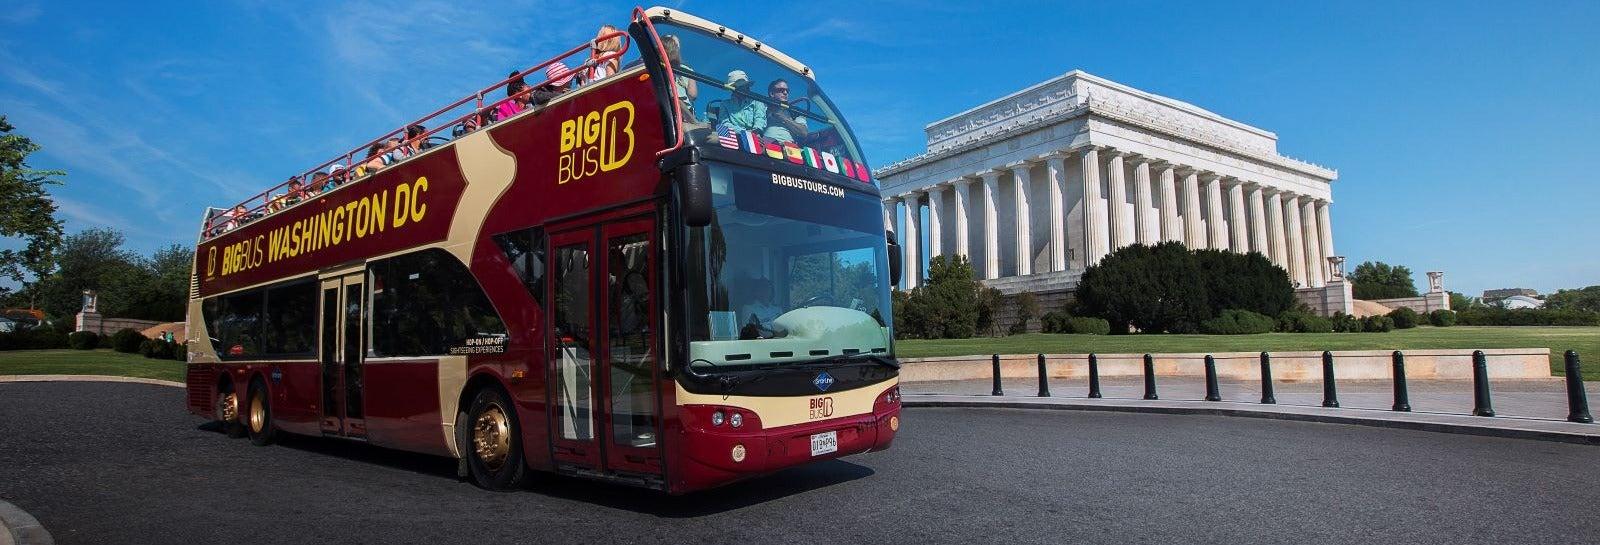 Ônibus turístico de Washington DC